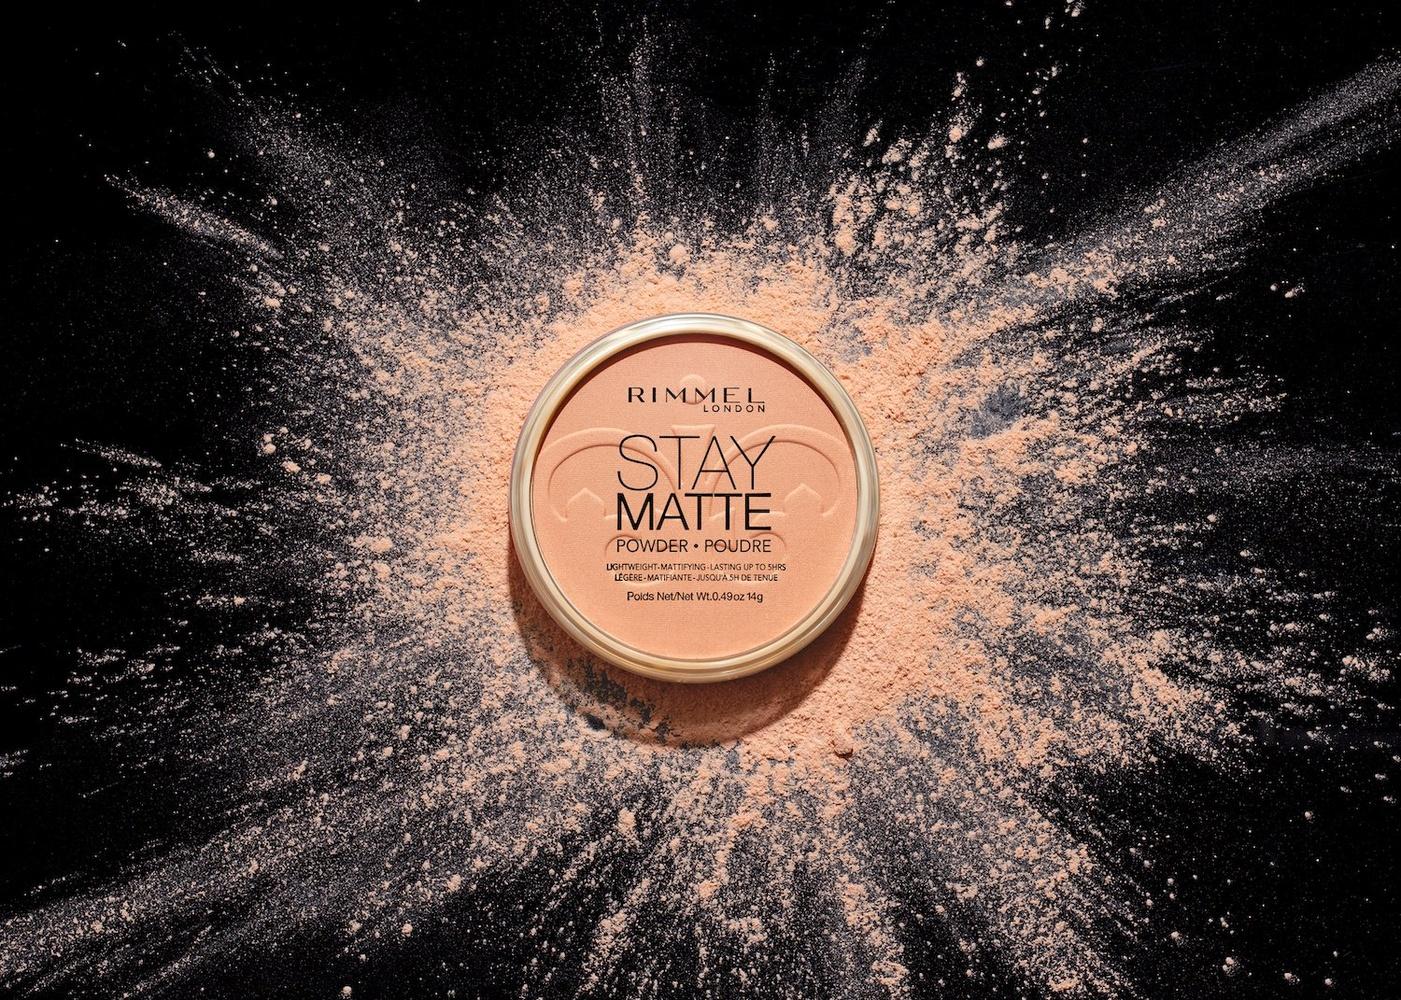 Stay Matte by Daniel Jackson